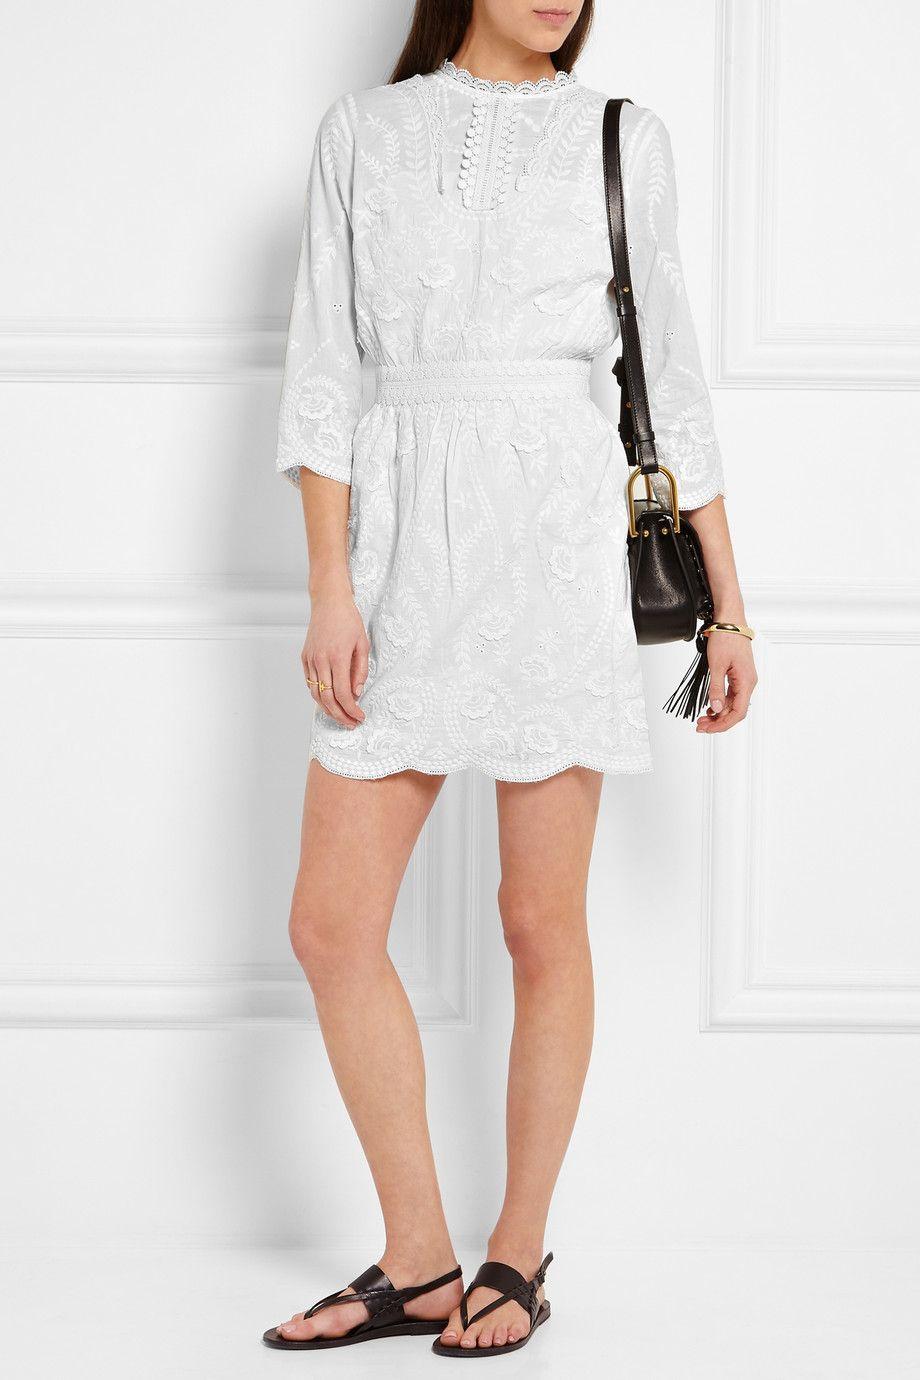 Blanc Casse Mini Robe En Coton Et Broderies Evangelista Vanessa Bruno Dresses Inspired Dress Mini Dress